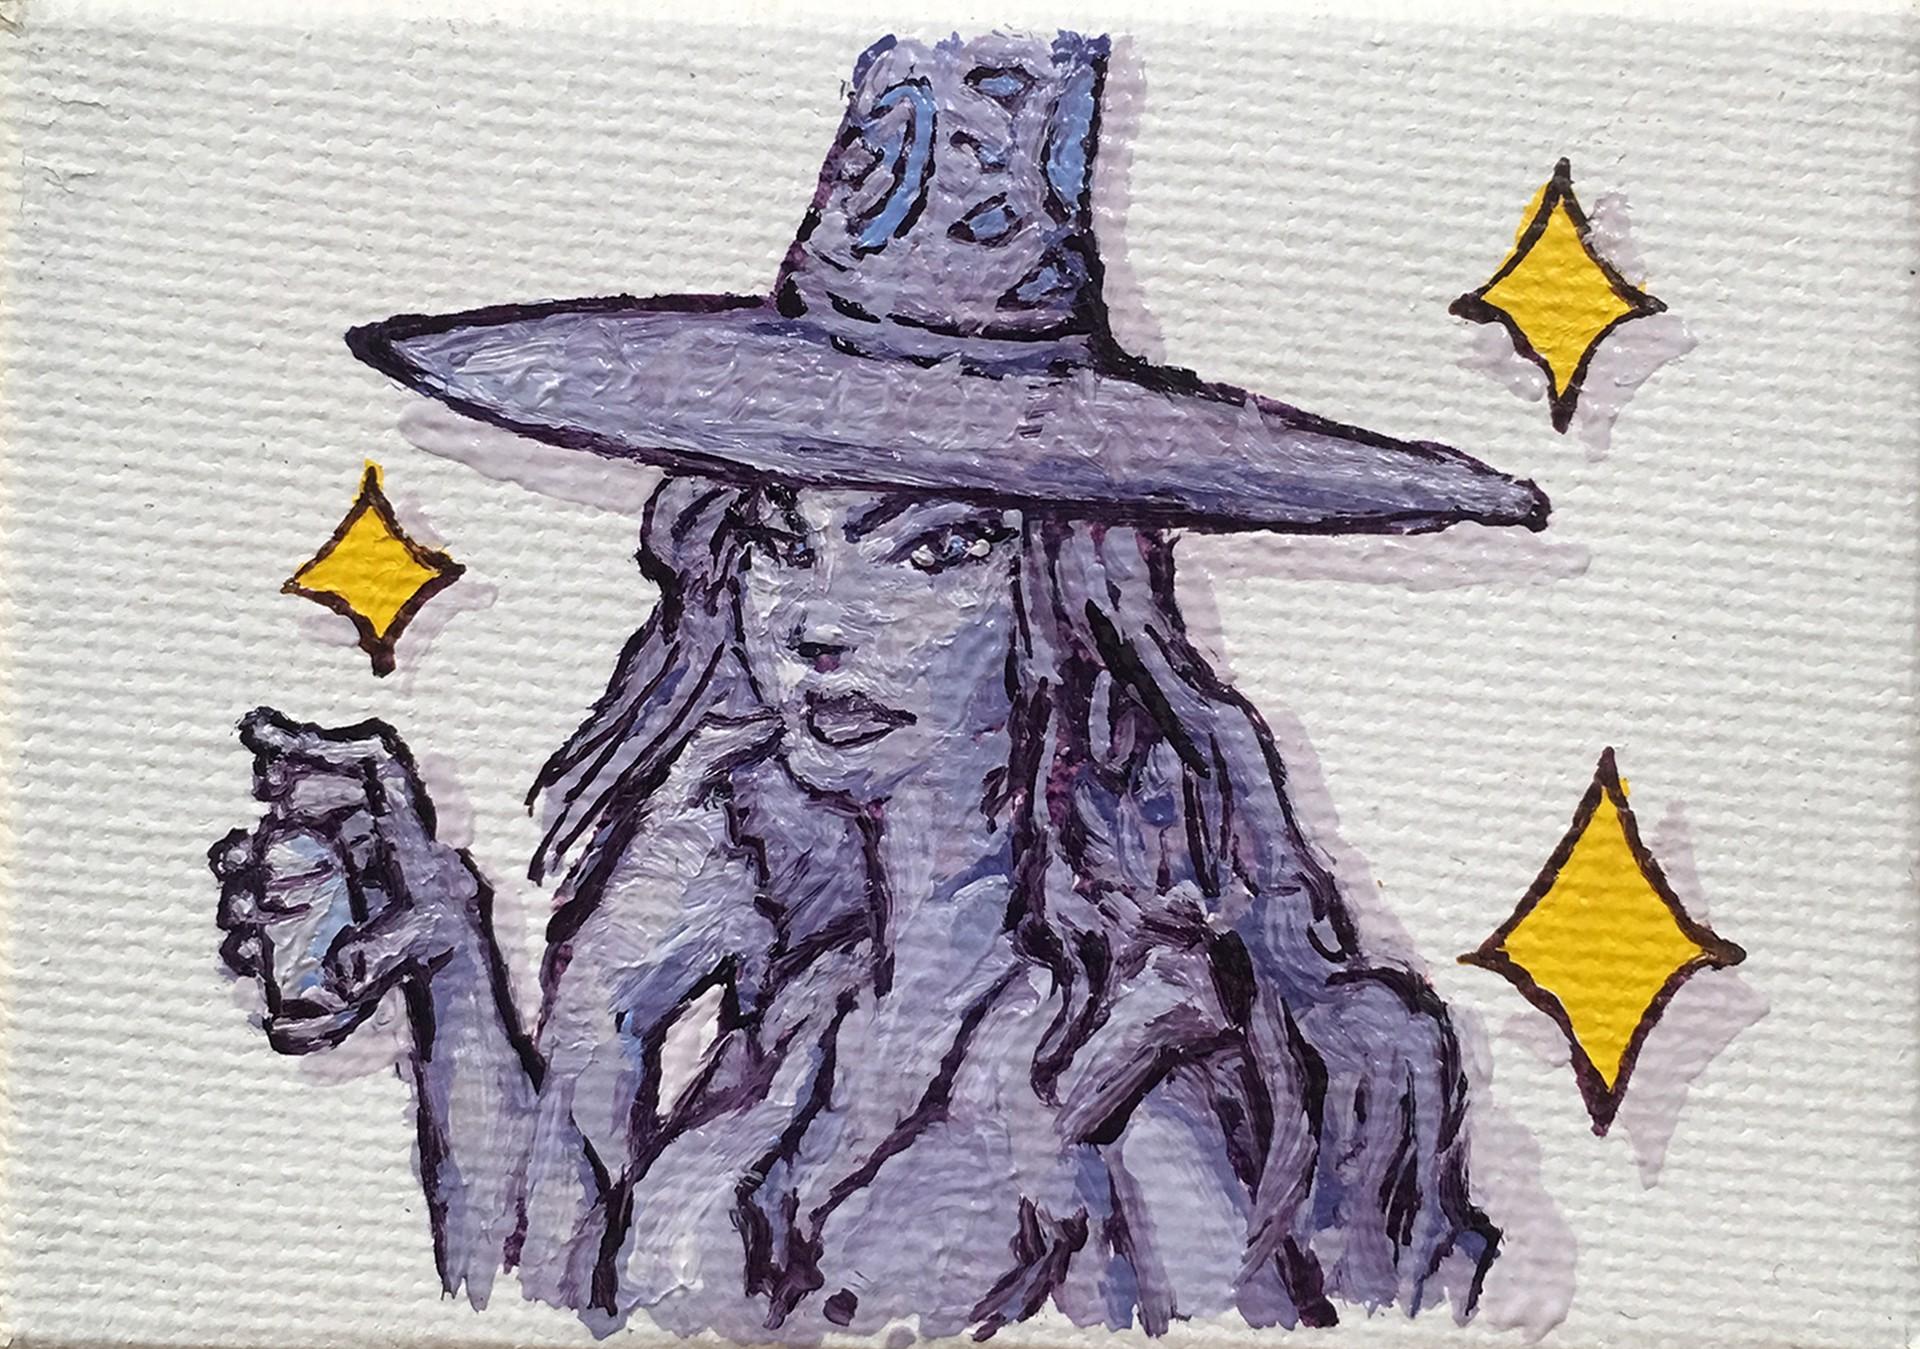 Witches Brew by Delton Demarest